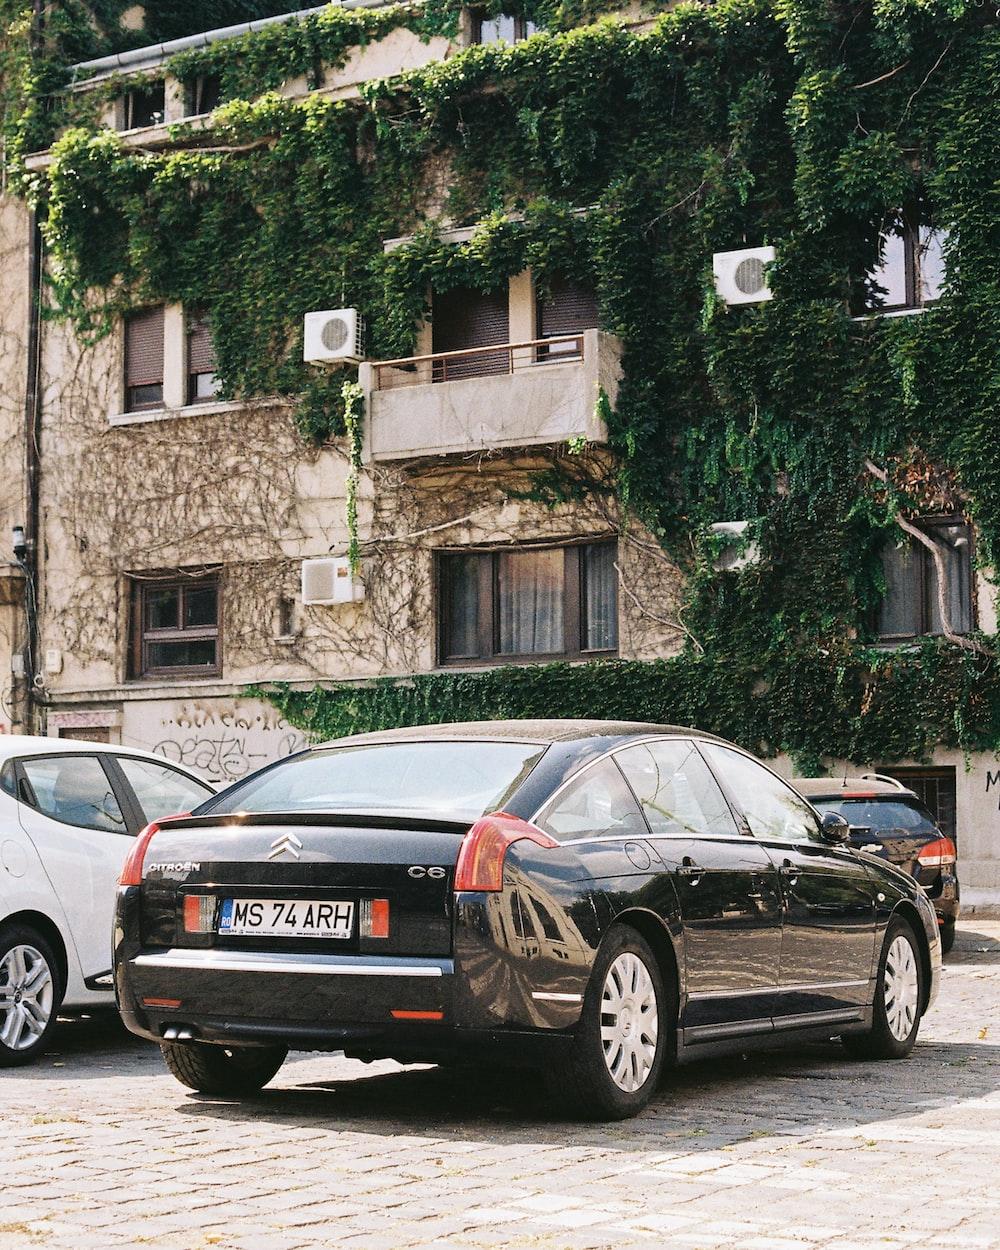 black car parked beside building